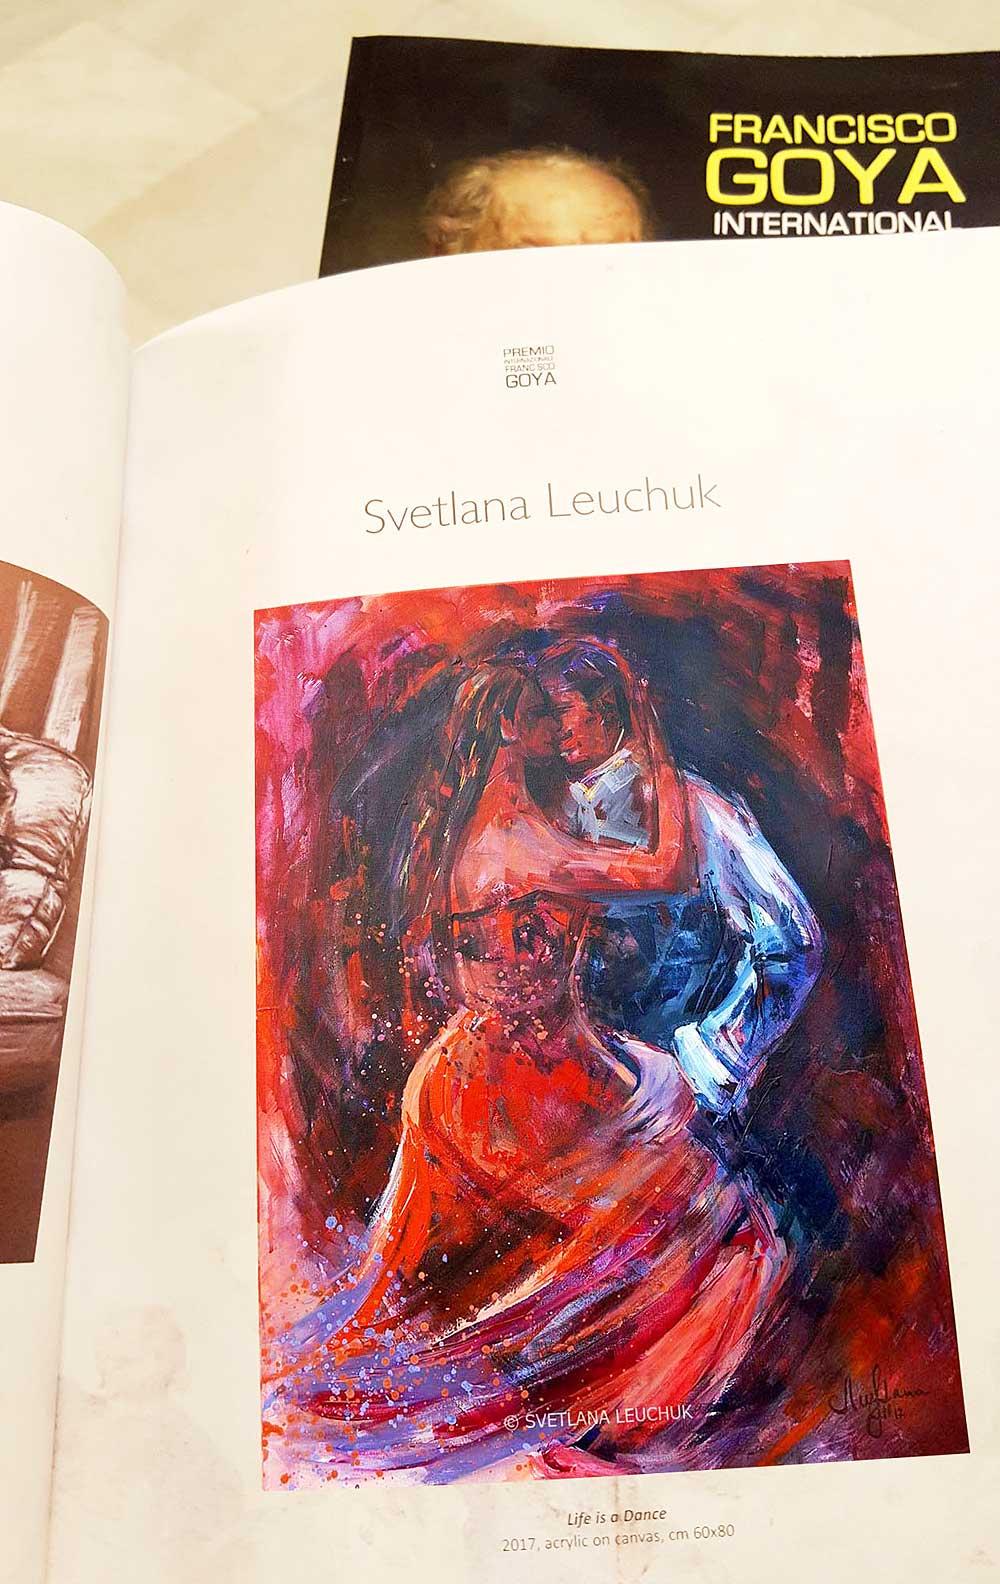 francisco-goya-premio-publication-artist-lana-leuchuk